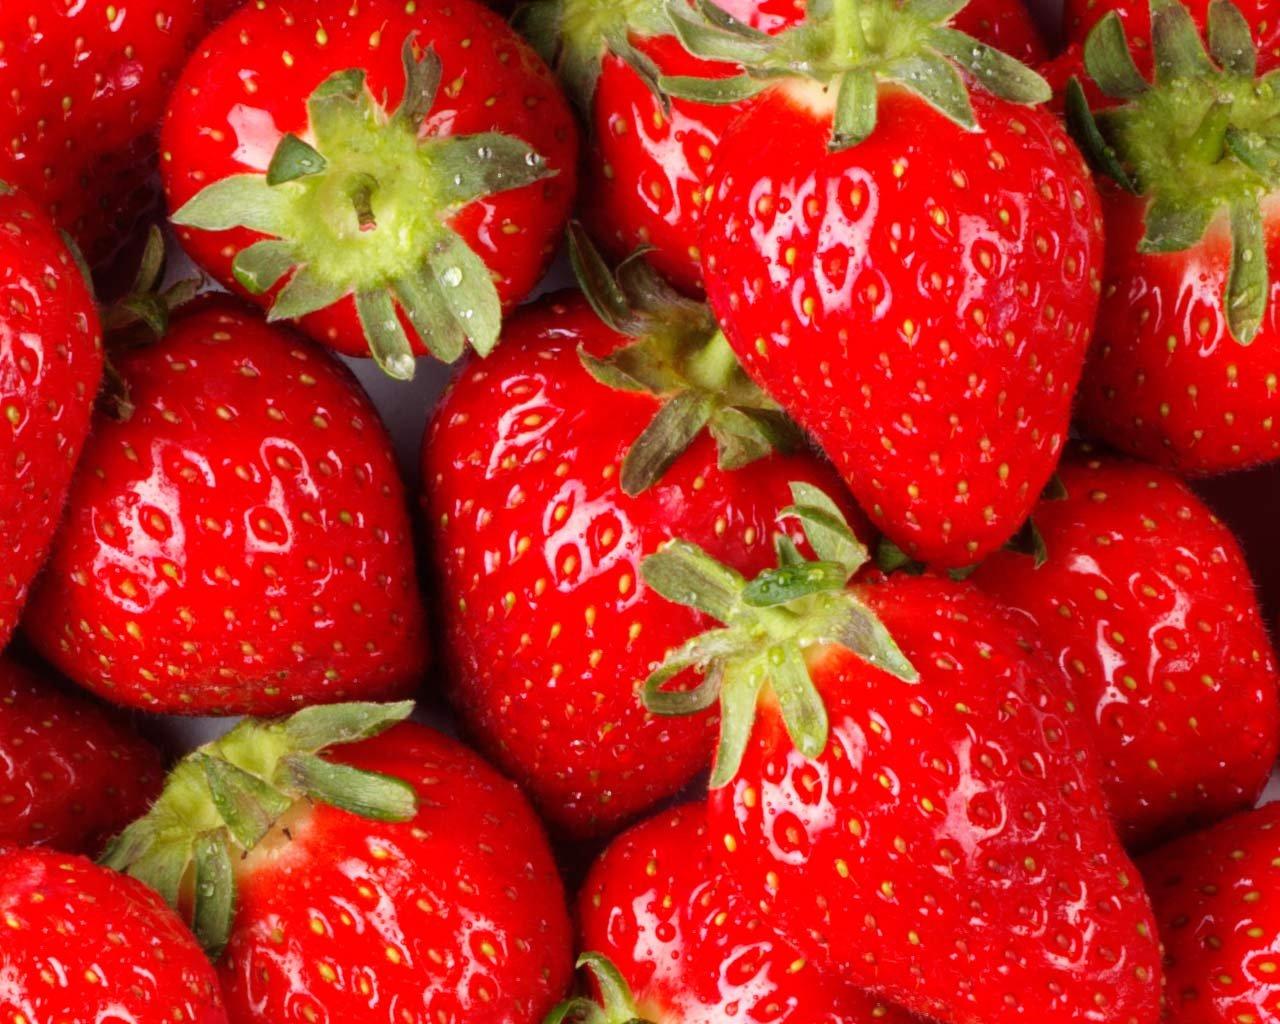 Foods-that-control-Diabetes-Strawberries